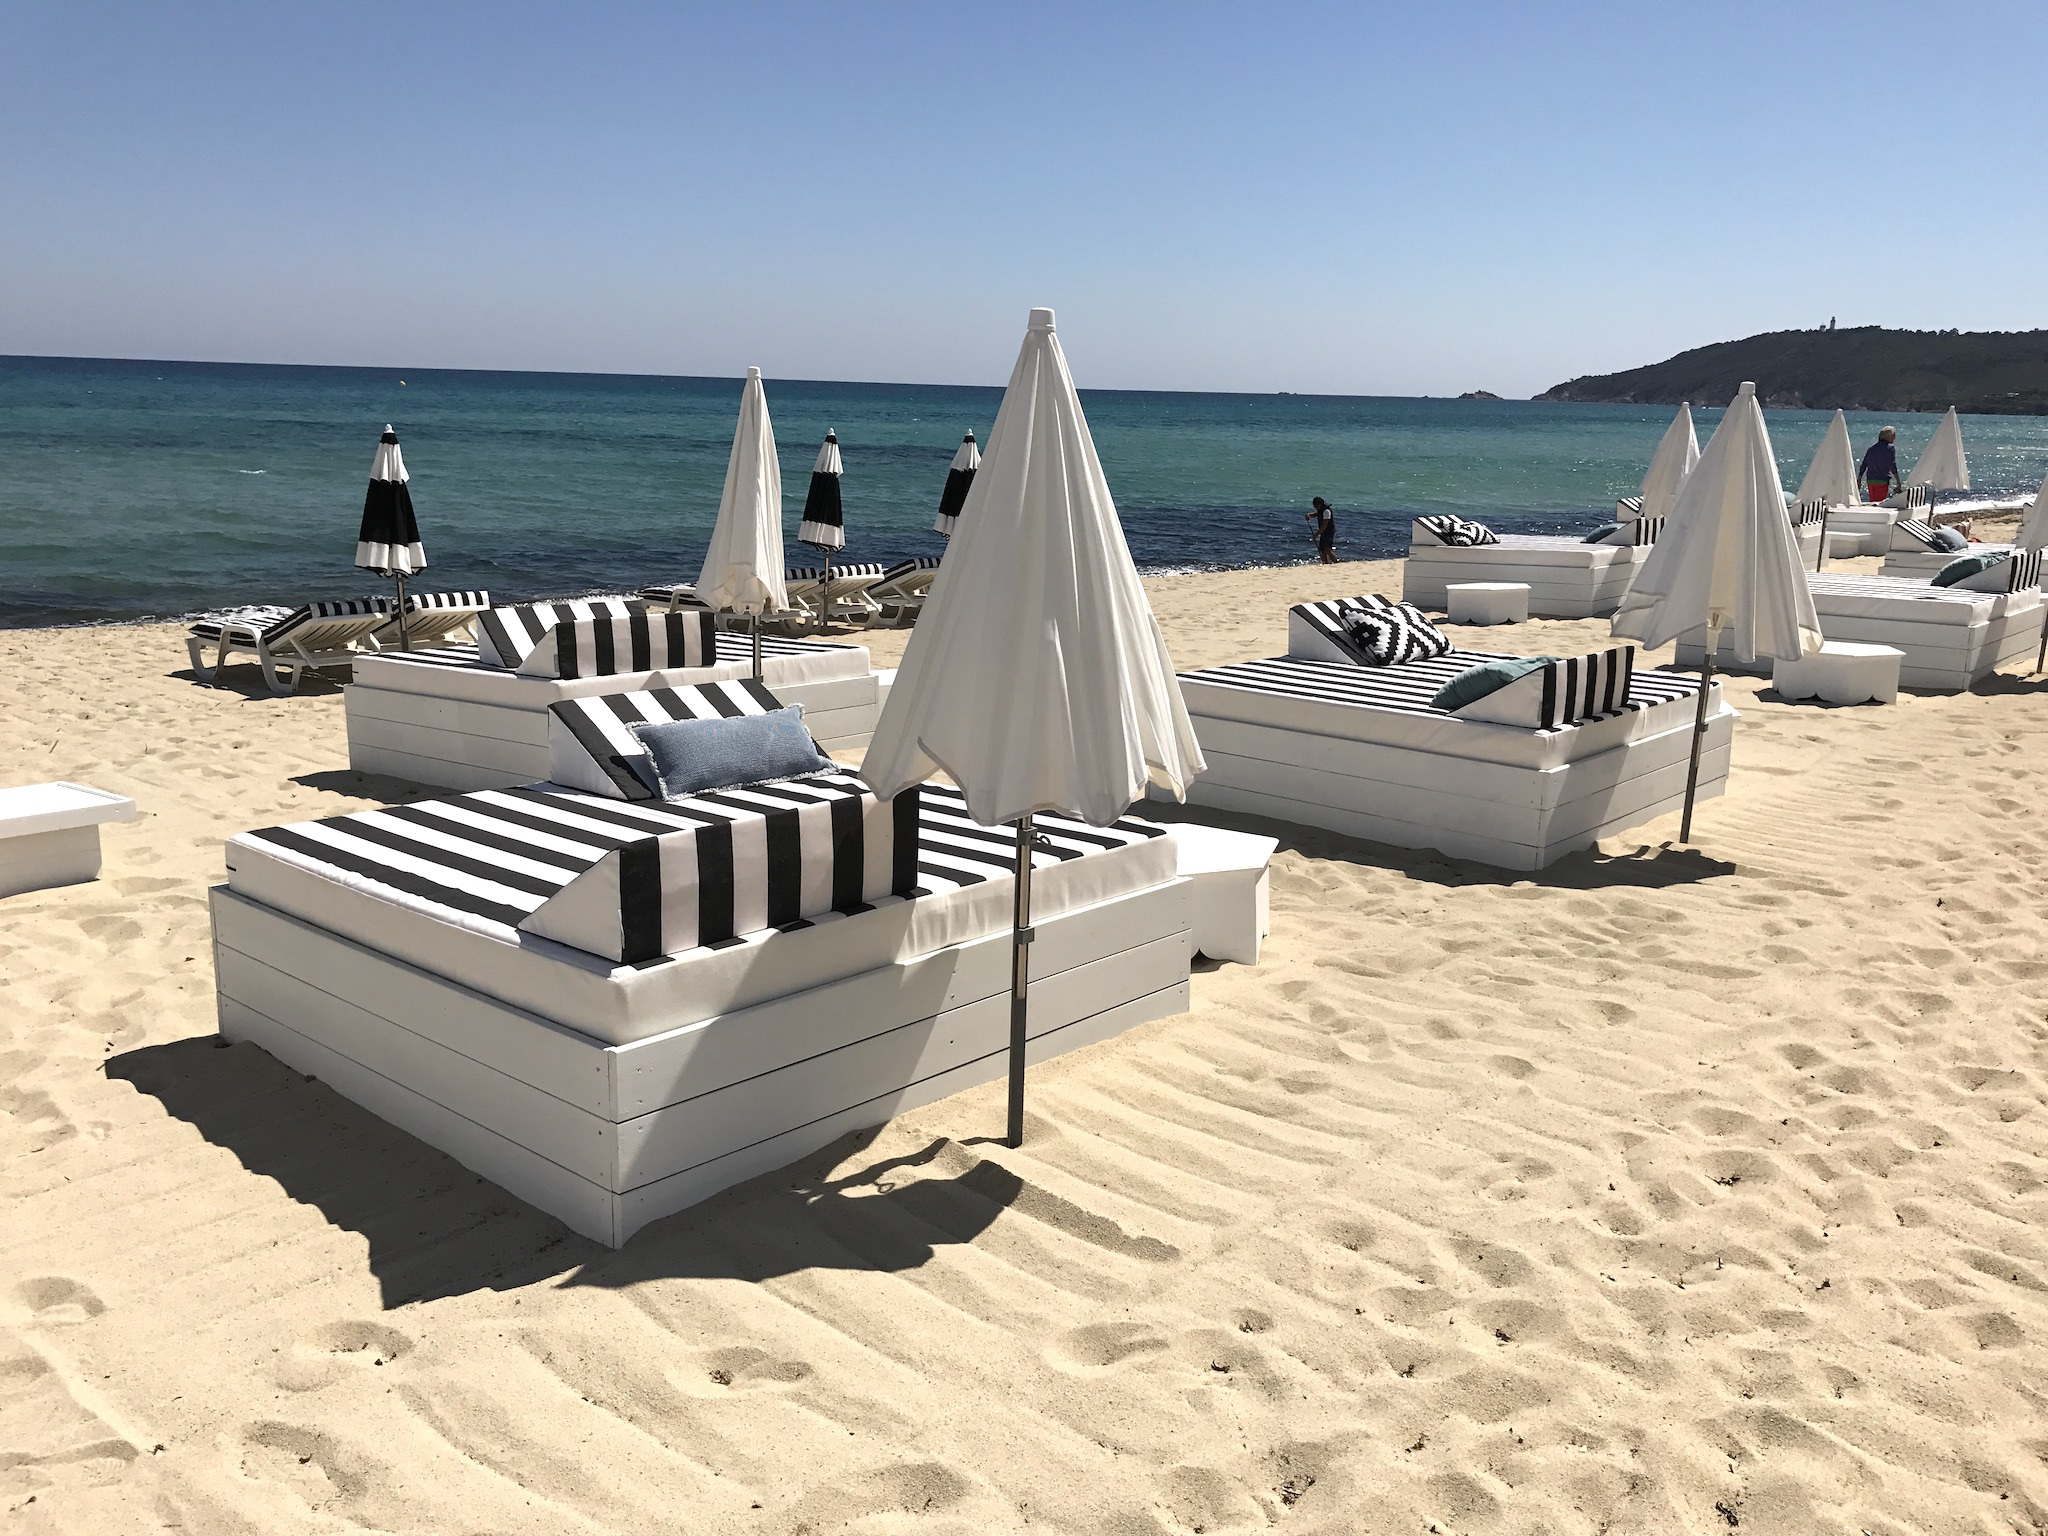 neu in st tropez maison bianca stylisher beach club pampelonne plage lieblingsstil. Black Bedroom Furniture Sets. Home Design Ideas